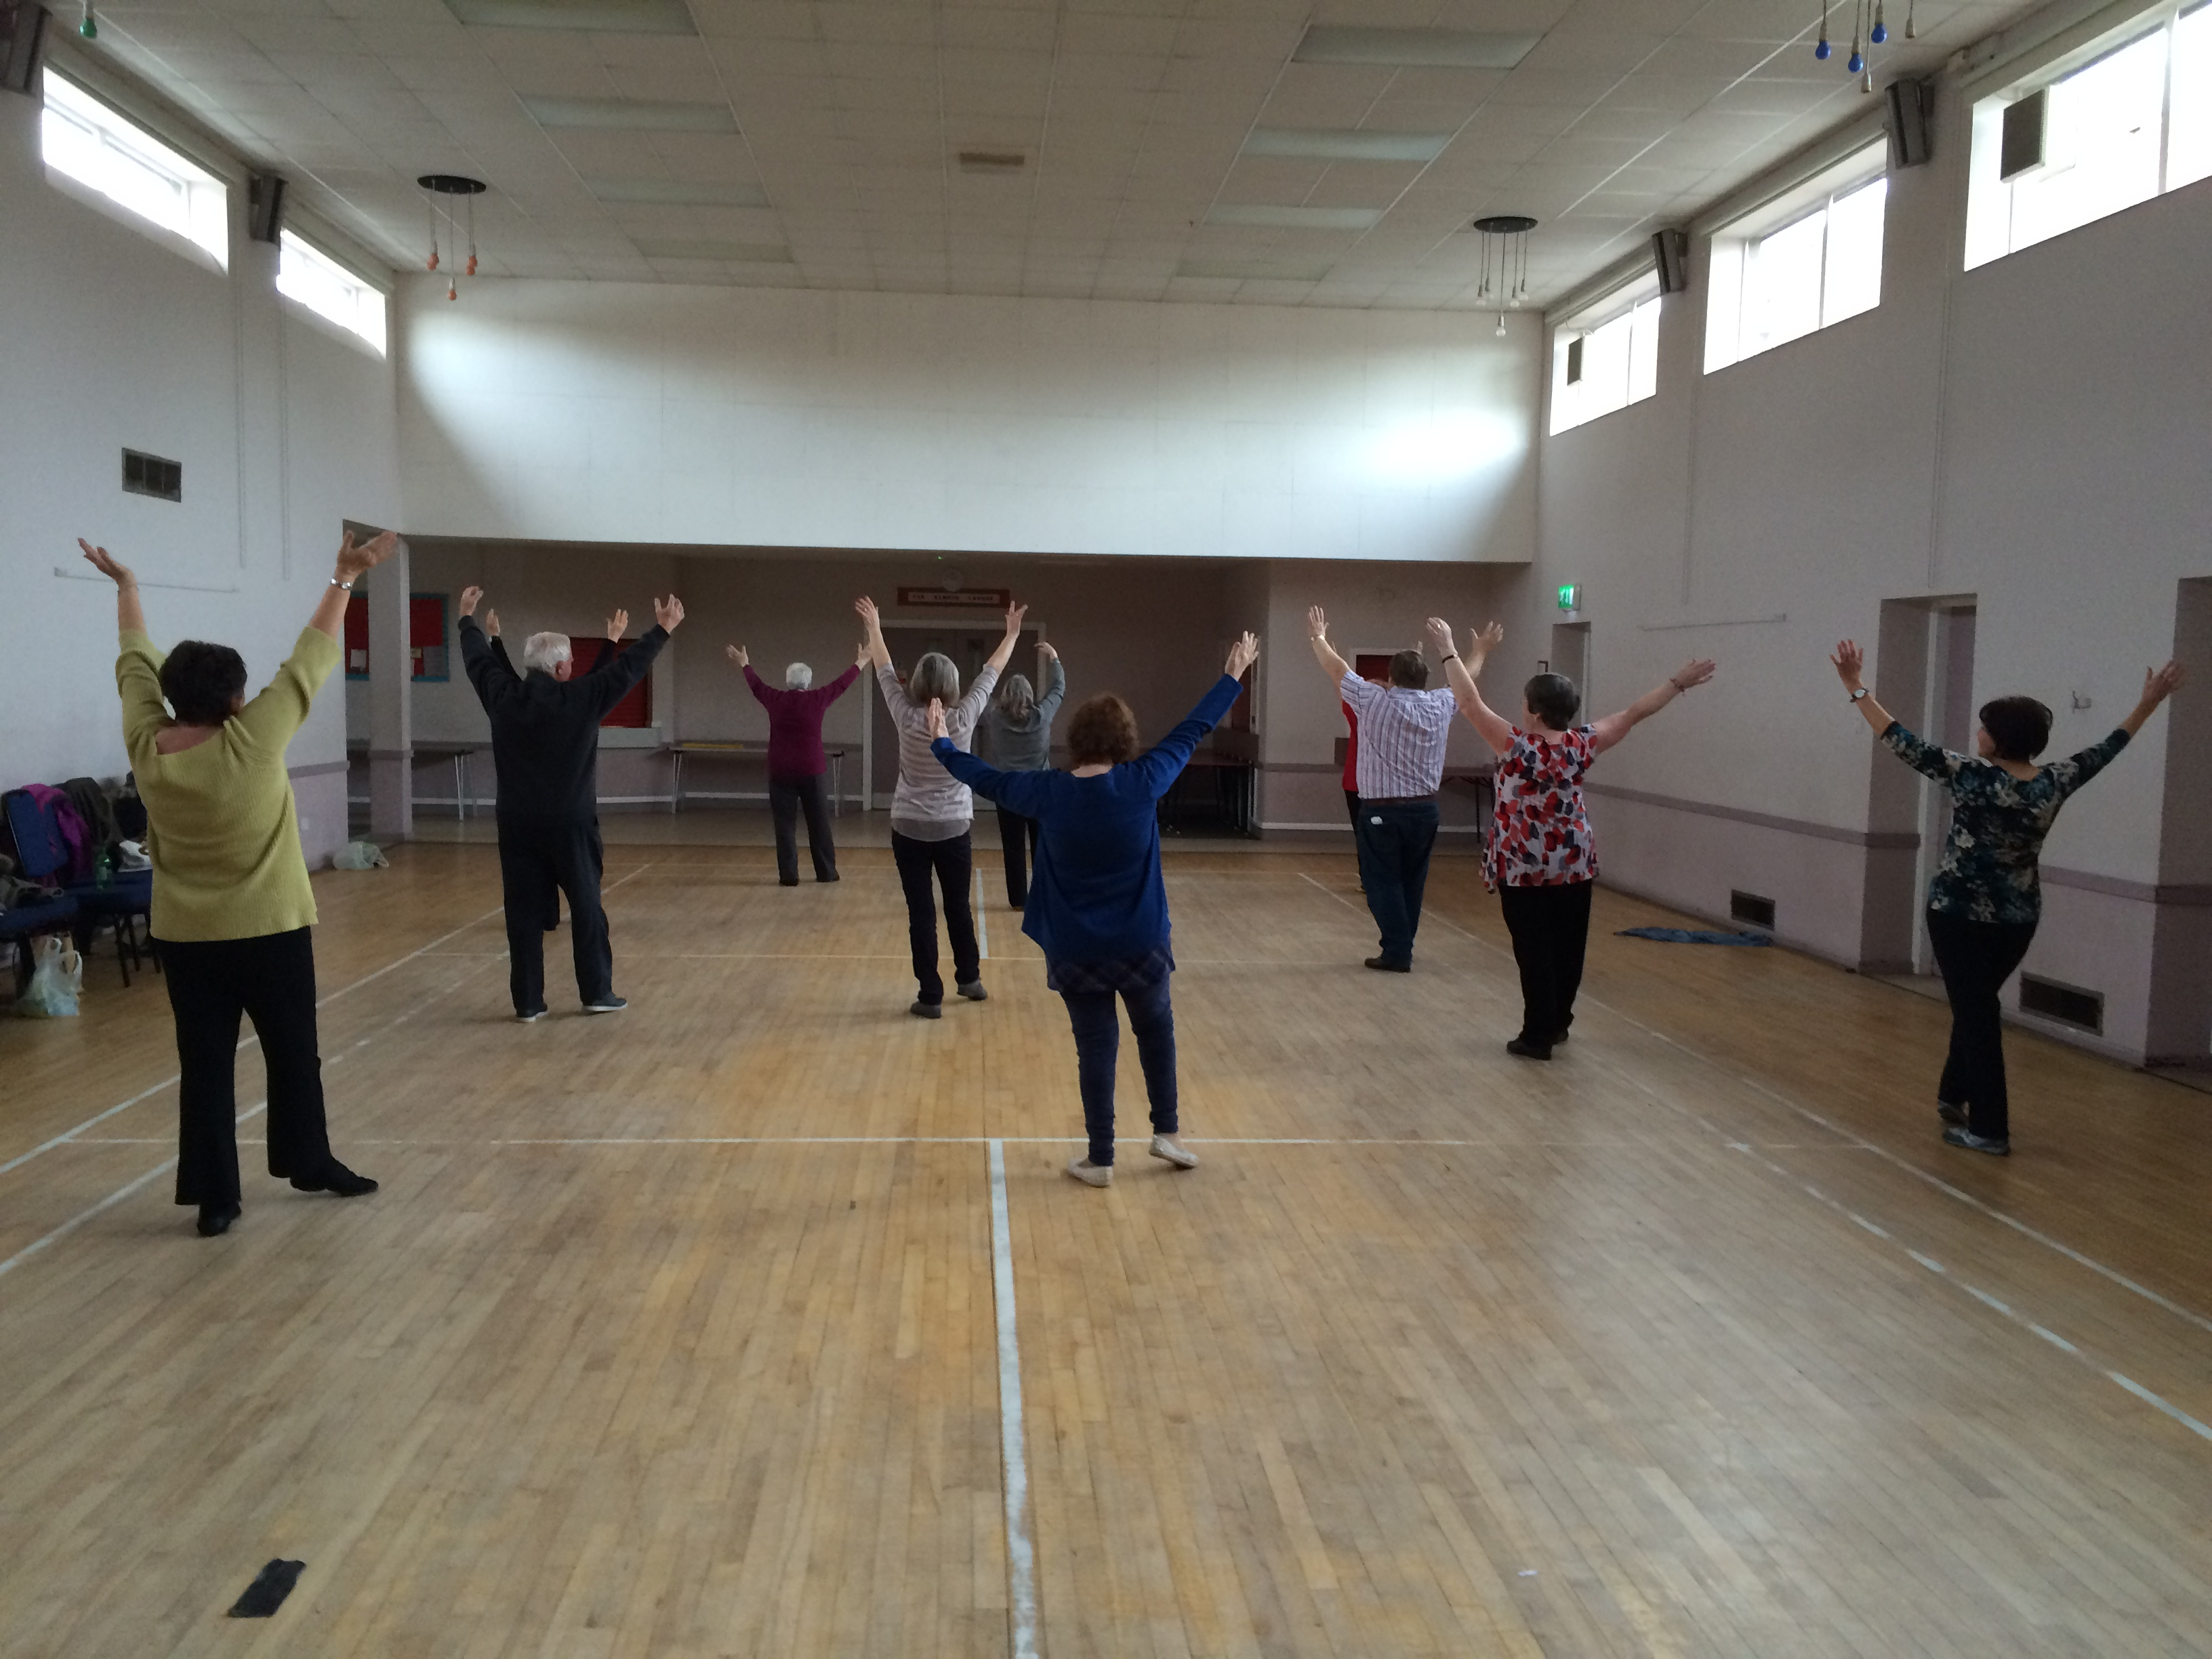 Over 50's dance class